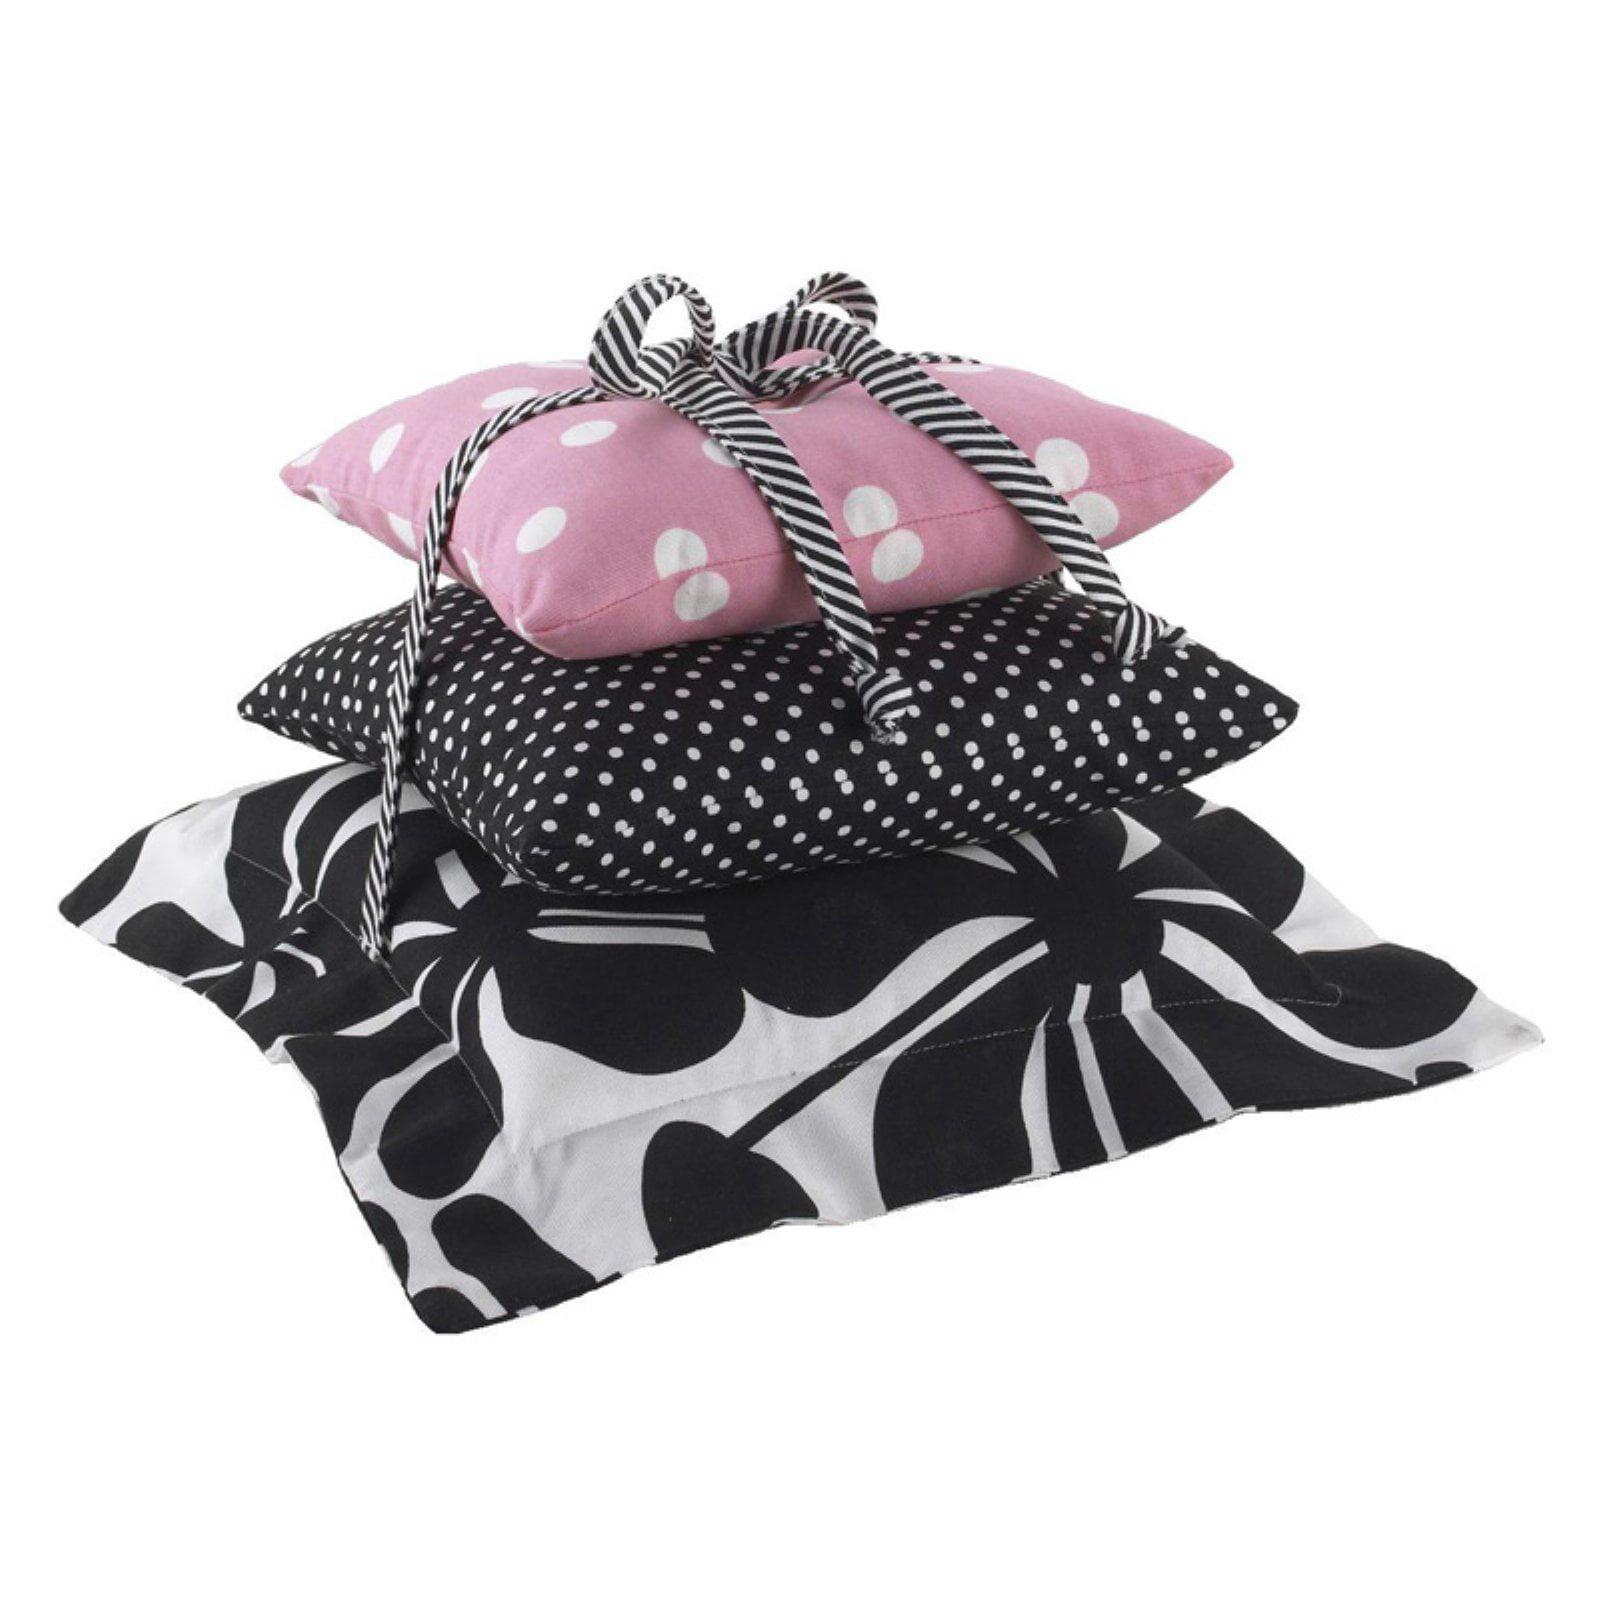 Cotton Tale Designs Girly 3 Piece Decorative Pillow